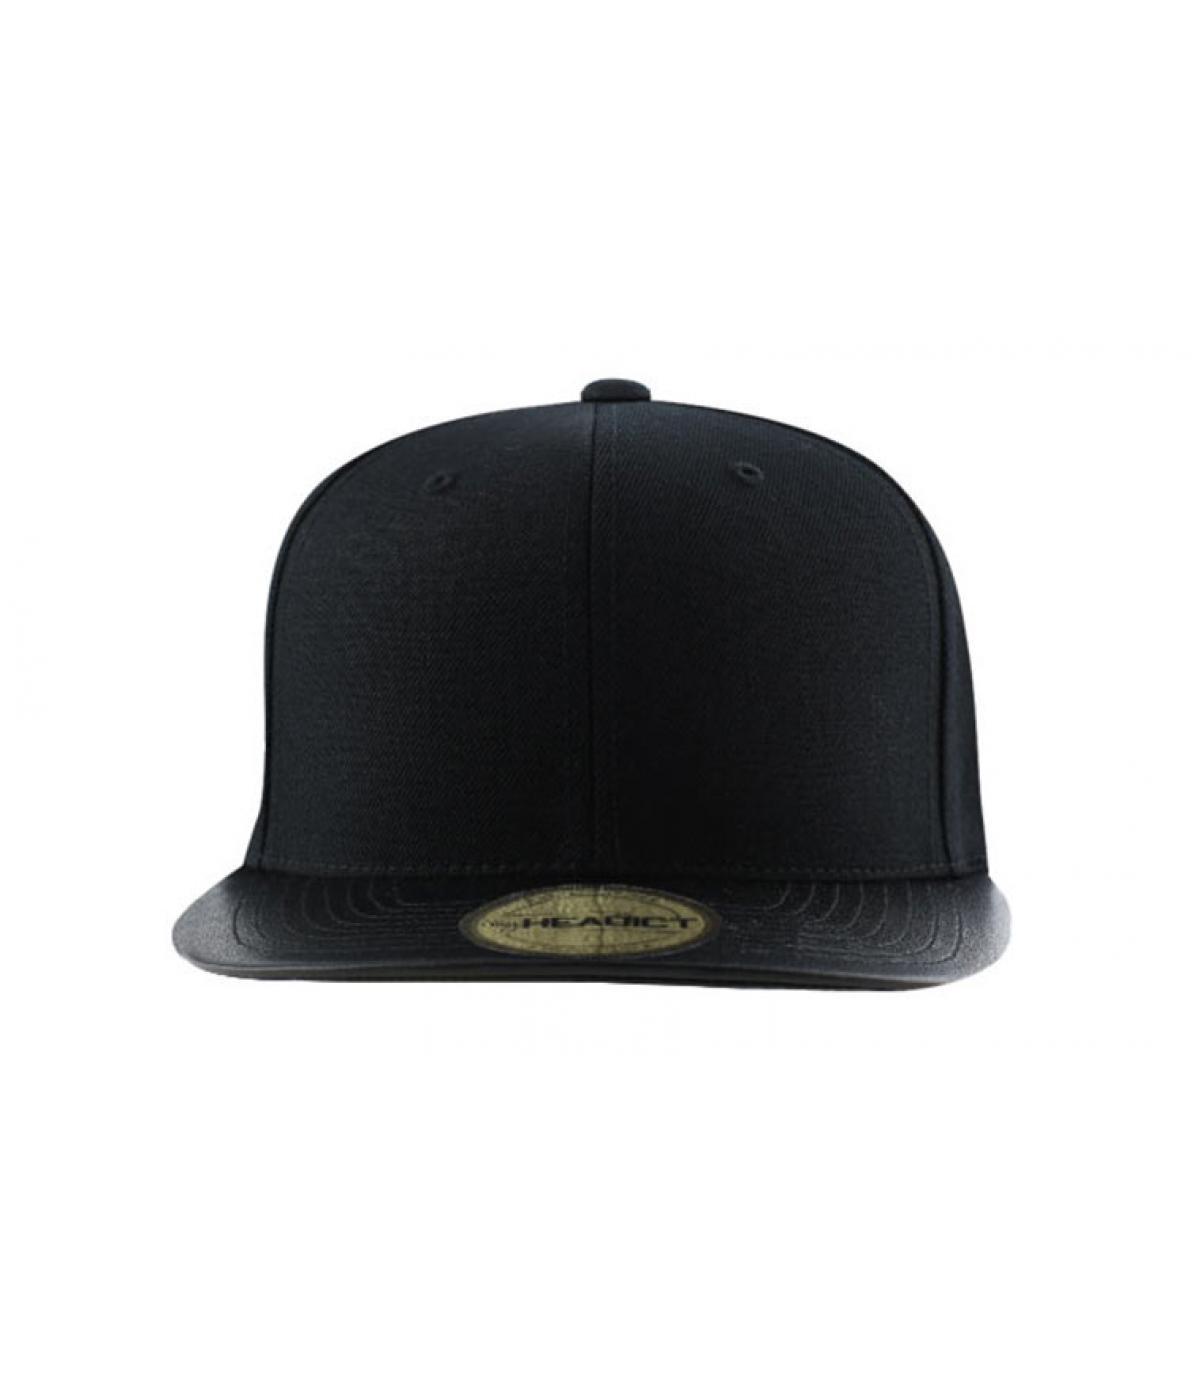 Snapback blank leather visor